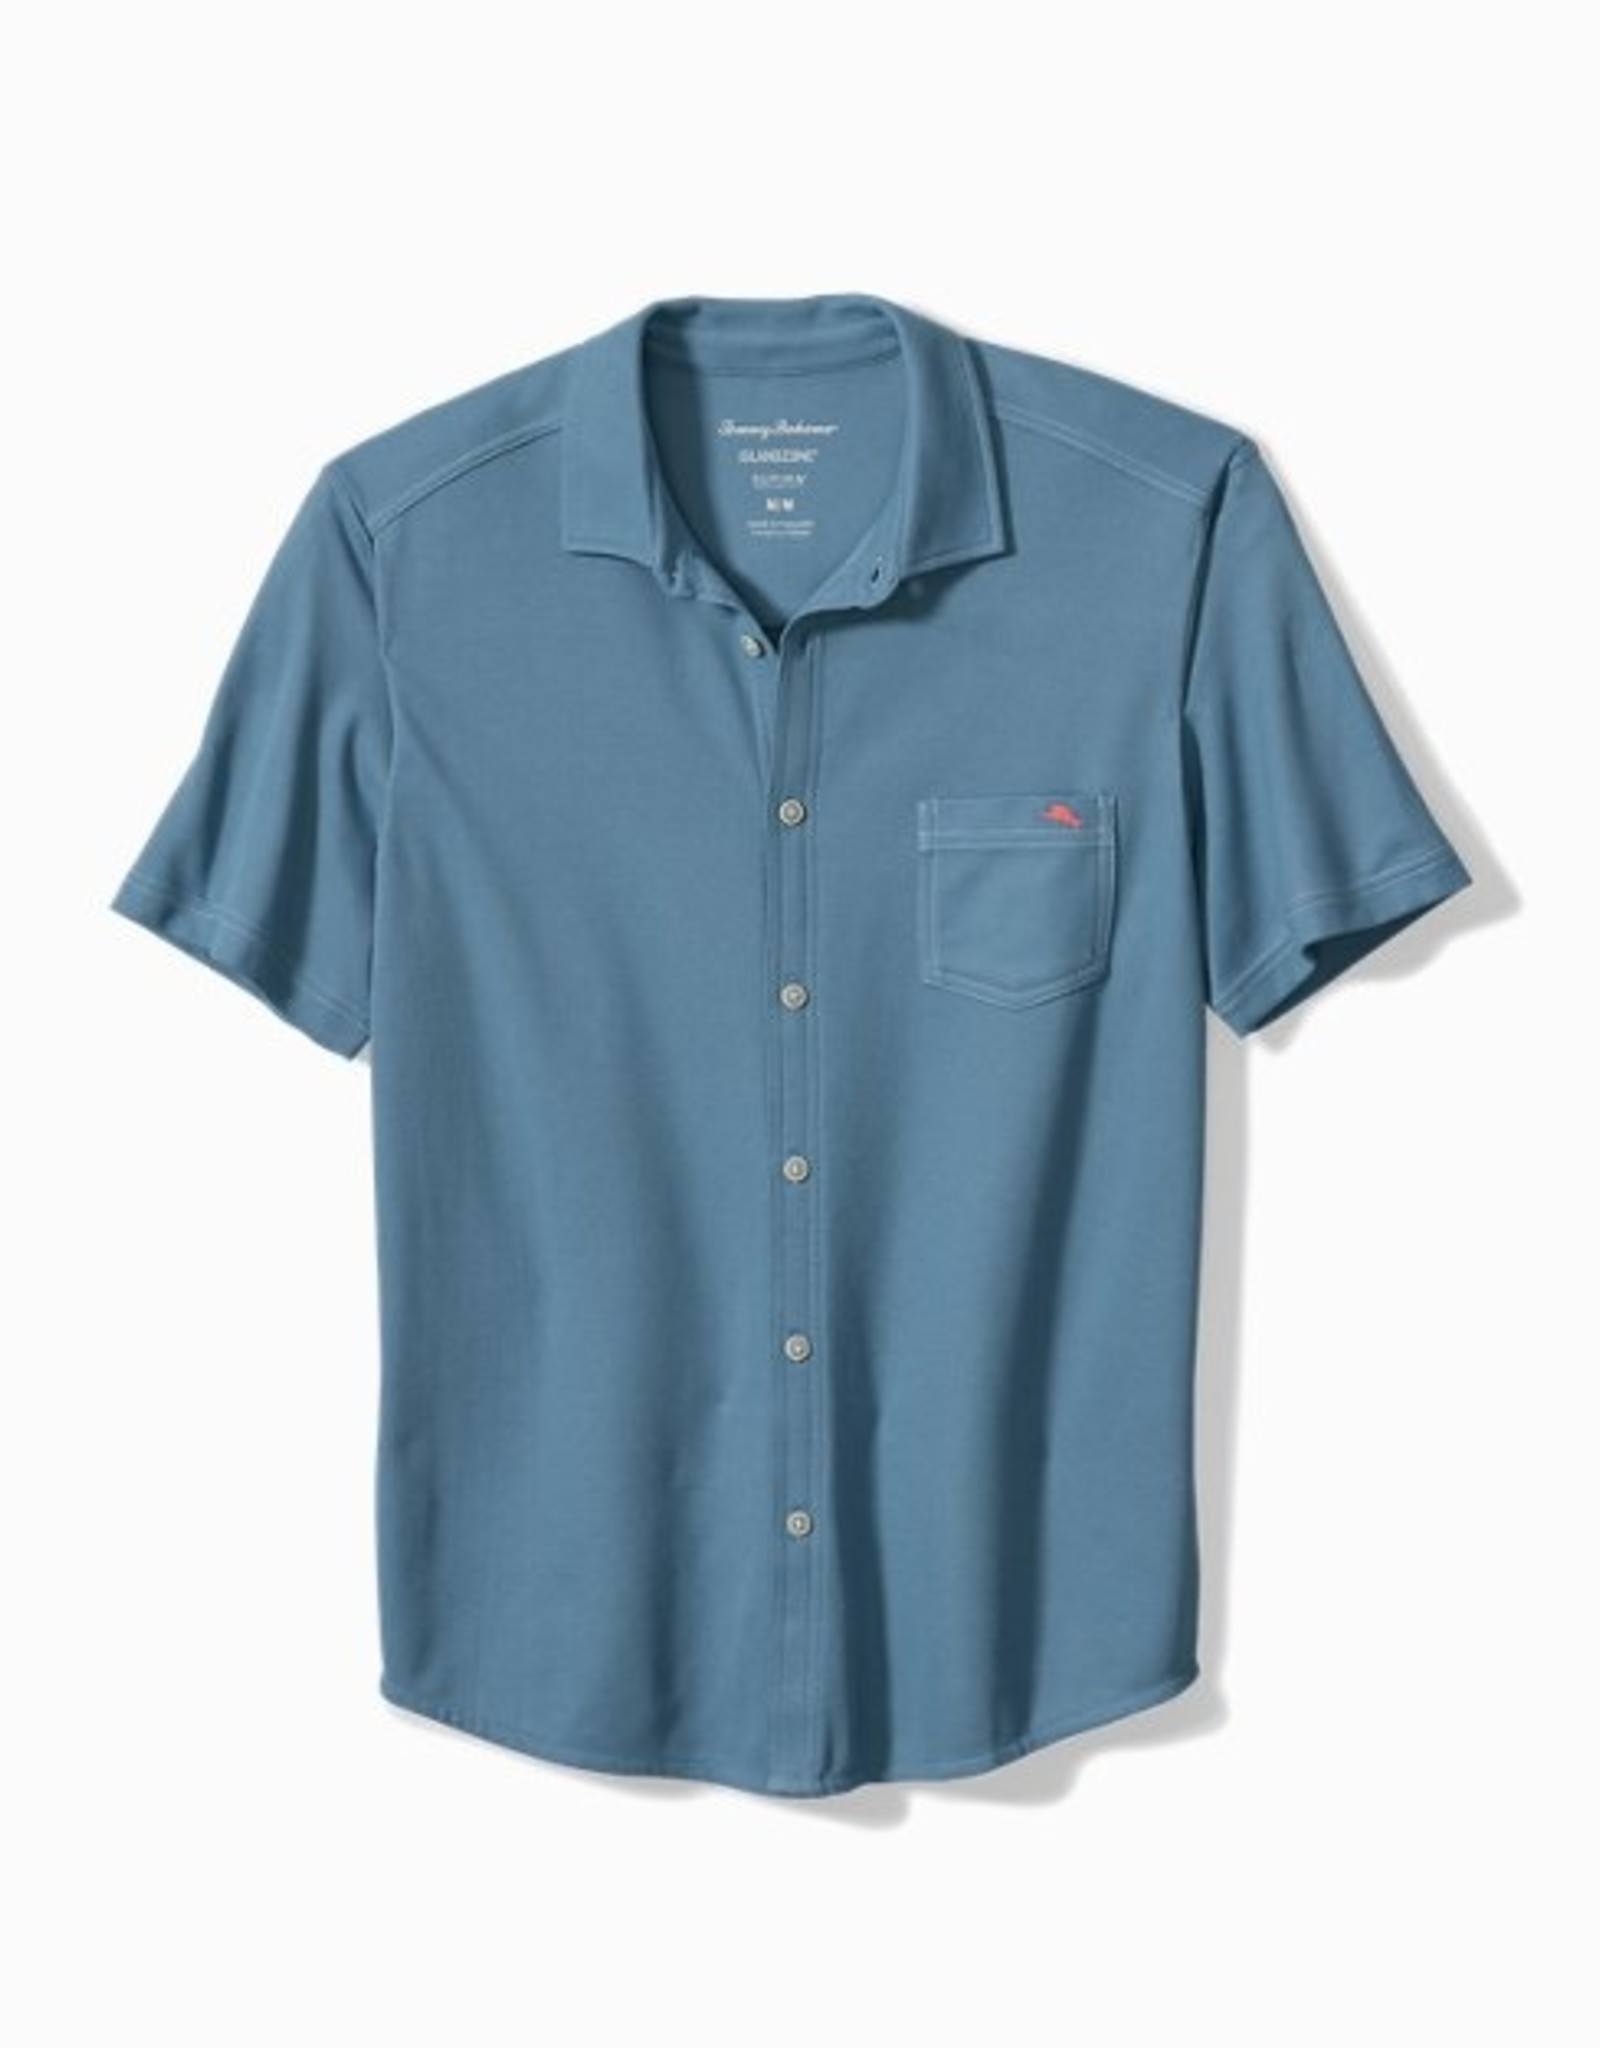 Tommy Bahama Emfielder Shirt